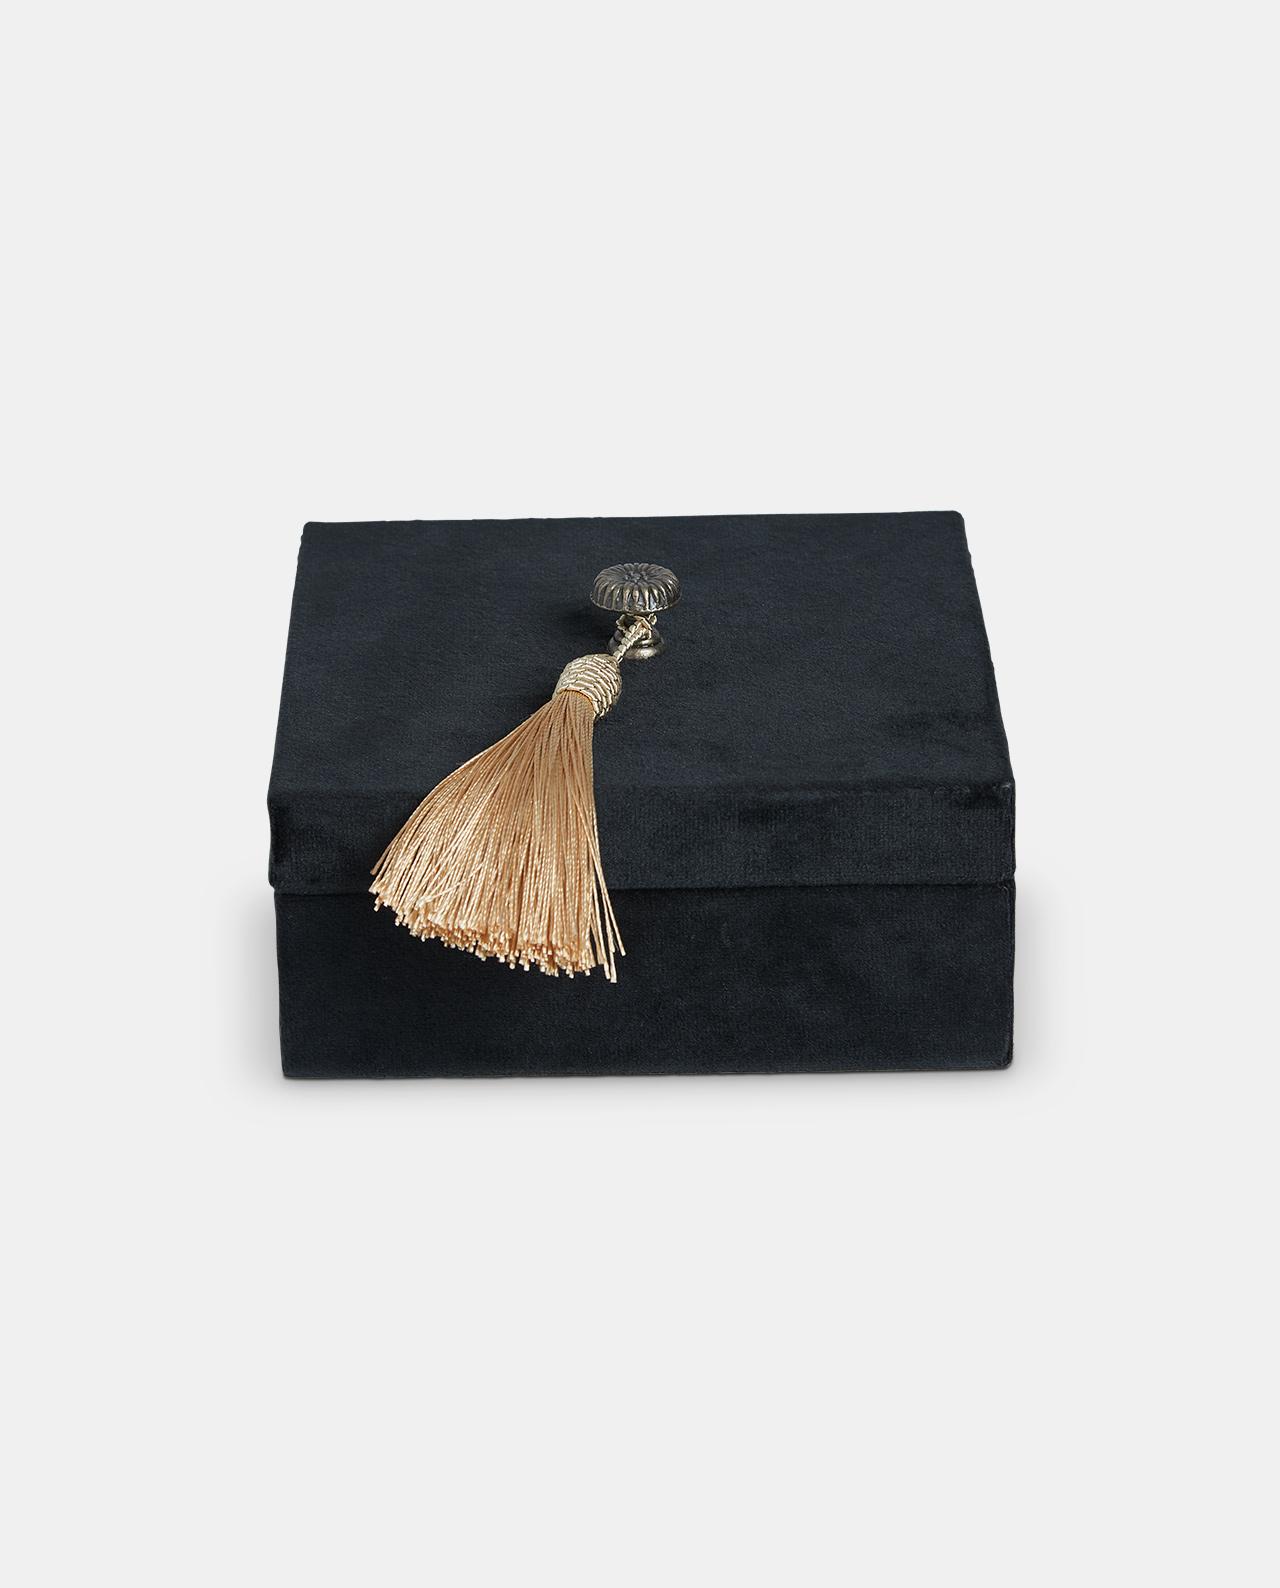 Large Black Velvet Decorative Box